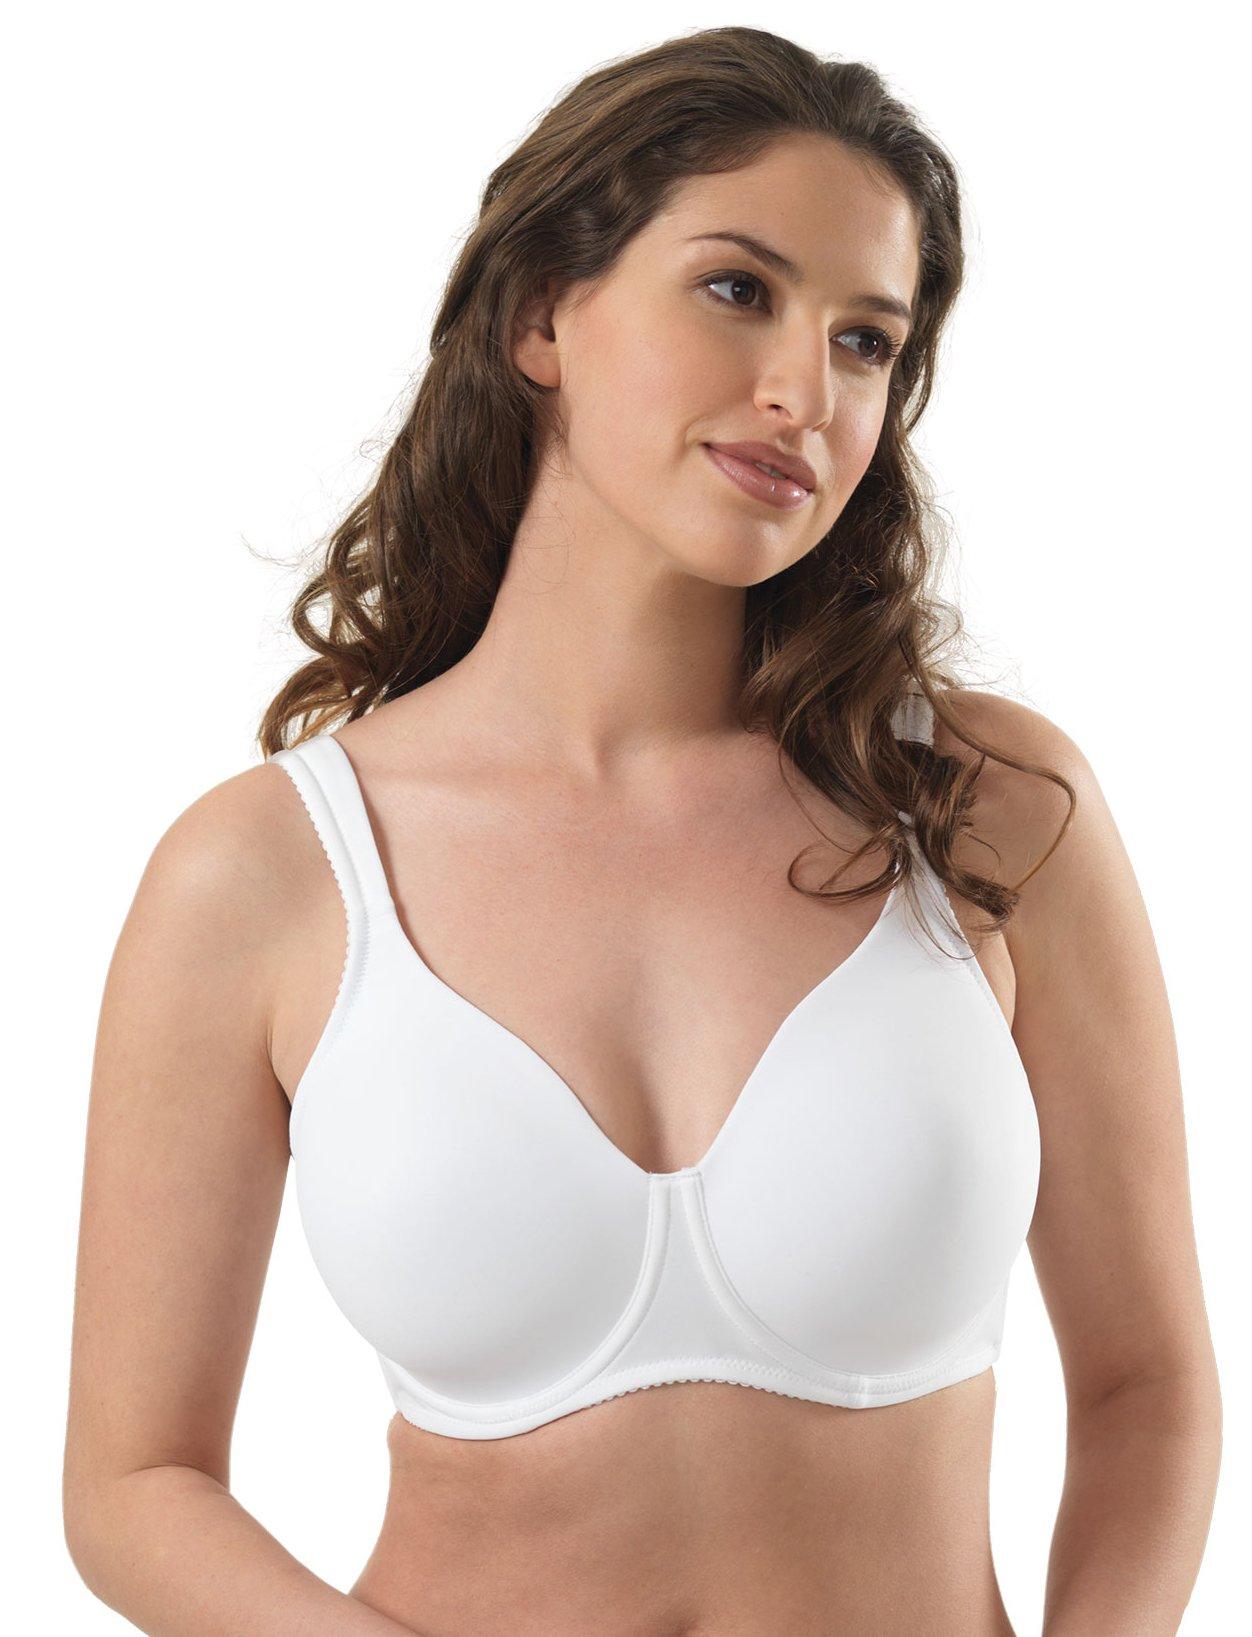 cf98fd10c80ff Leading Lady Women s Plus-Size Wireless Padded T-Shirt Bra. Product main  image